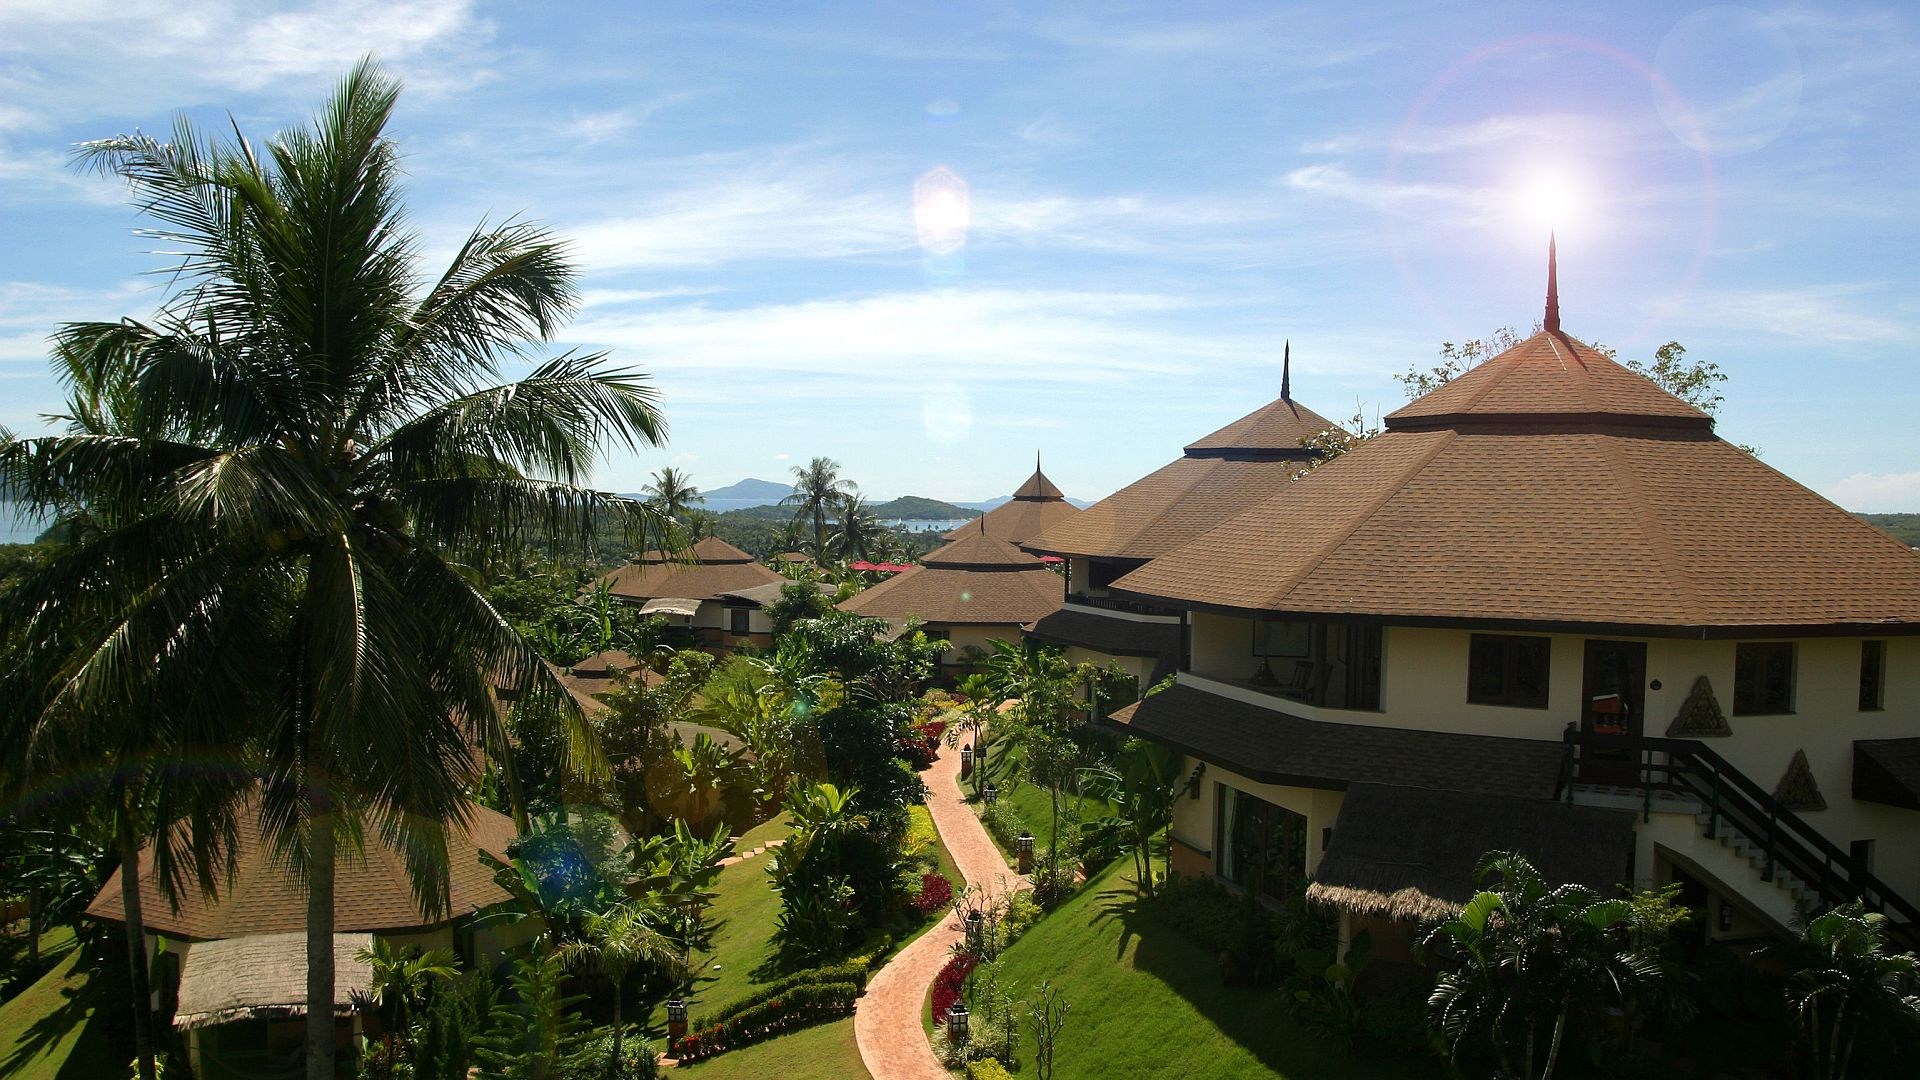 Phuket-Resorts-Mangosteen-Resort-and-Ayurveda-Spa-Royal-Jacuzzi-Villas-overview